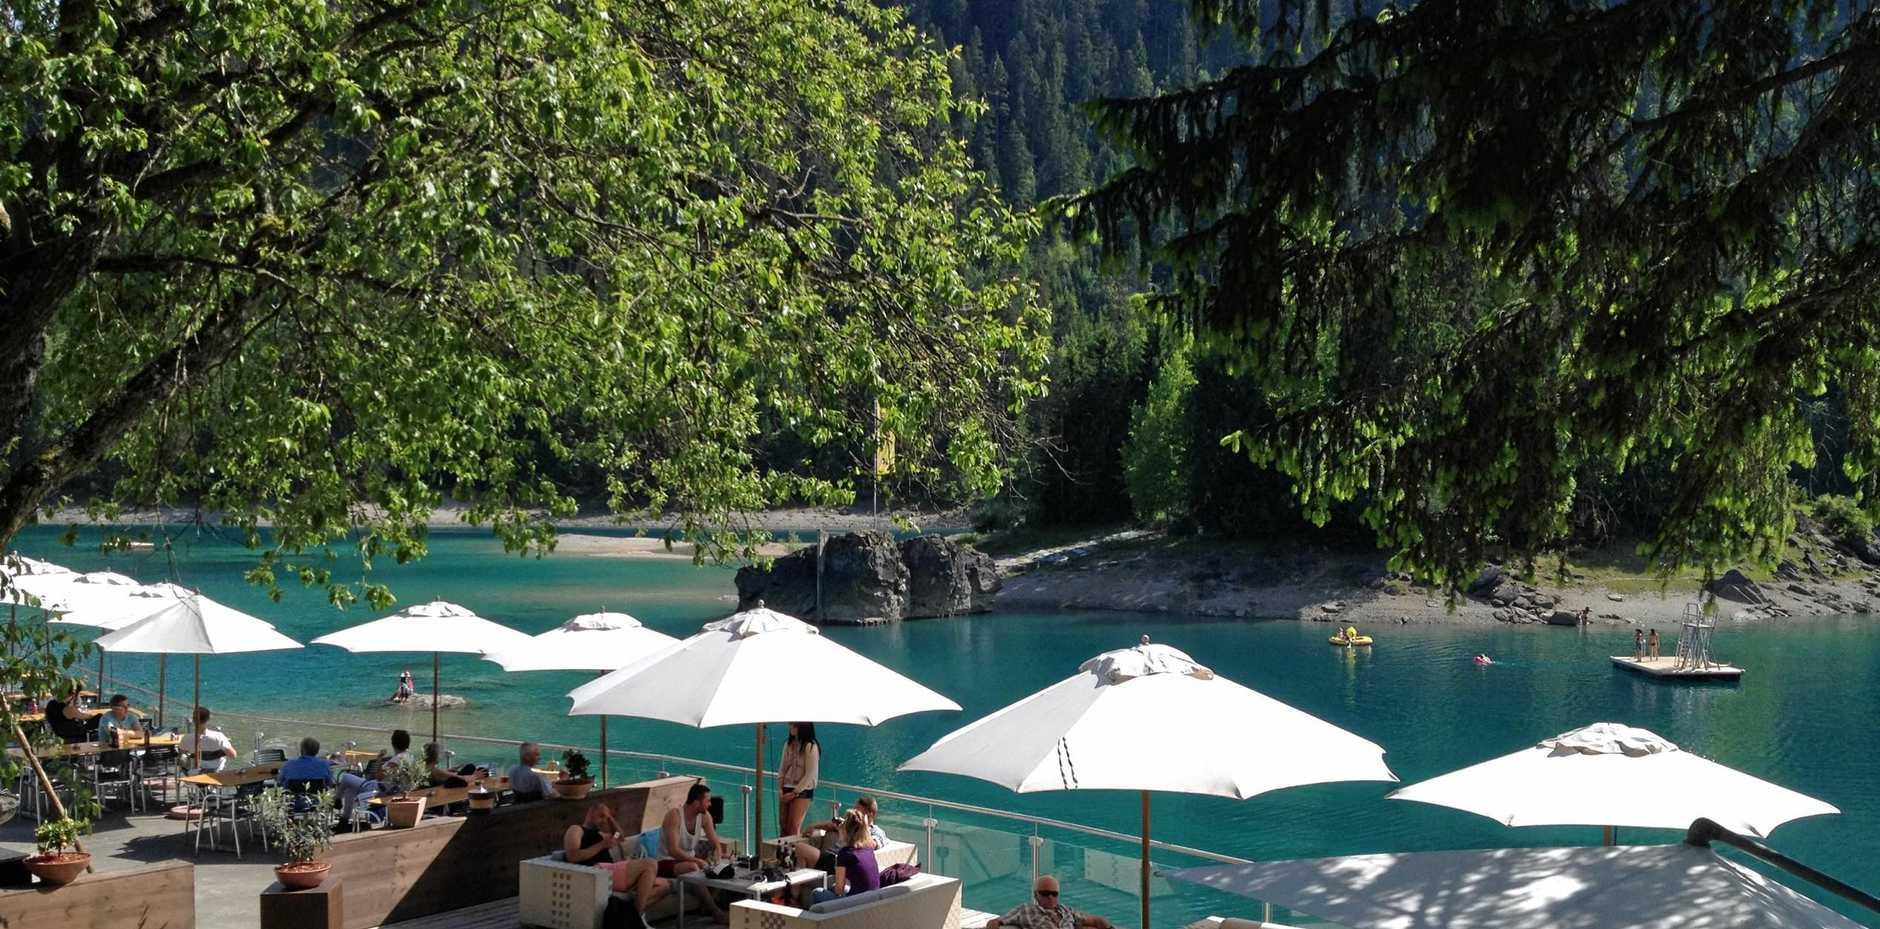 The stunning Caumasee Restaurant in Switzerland.